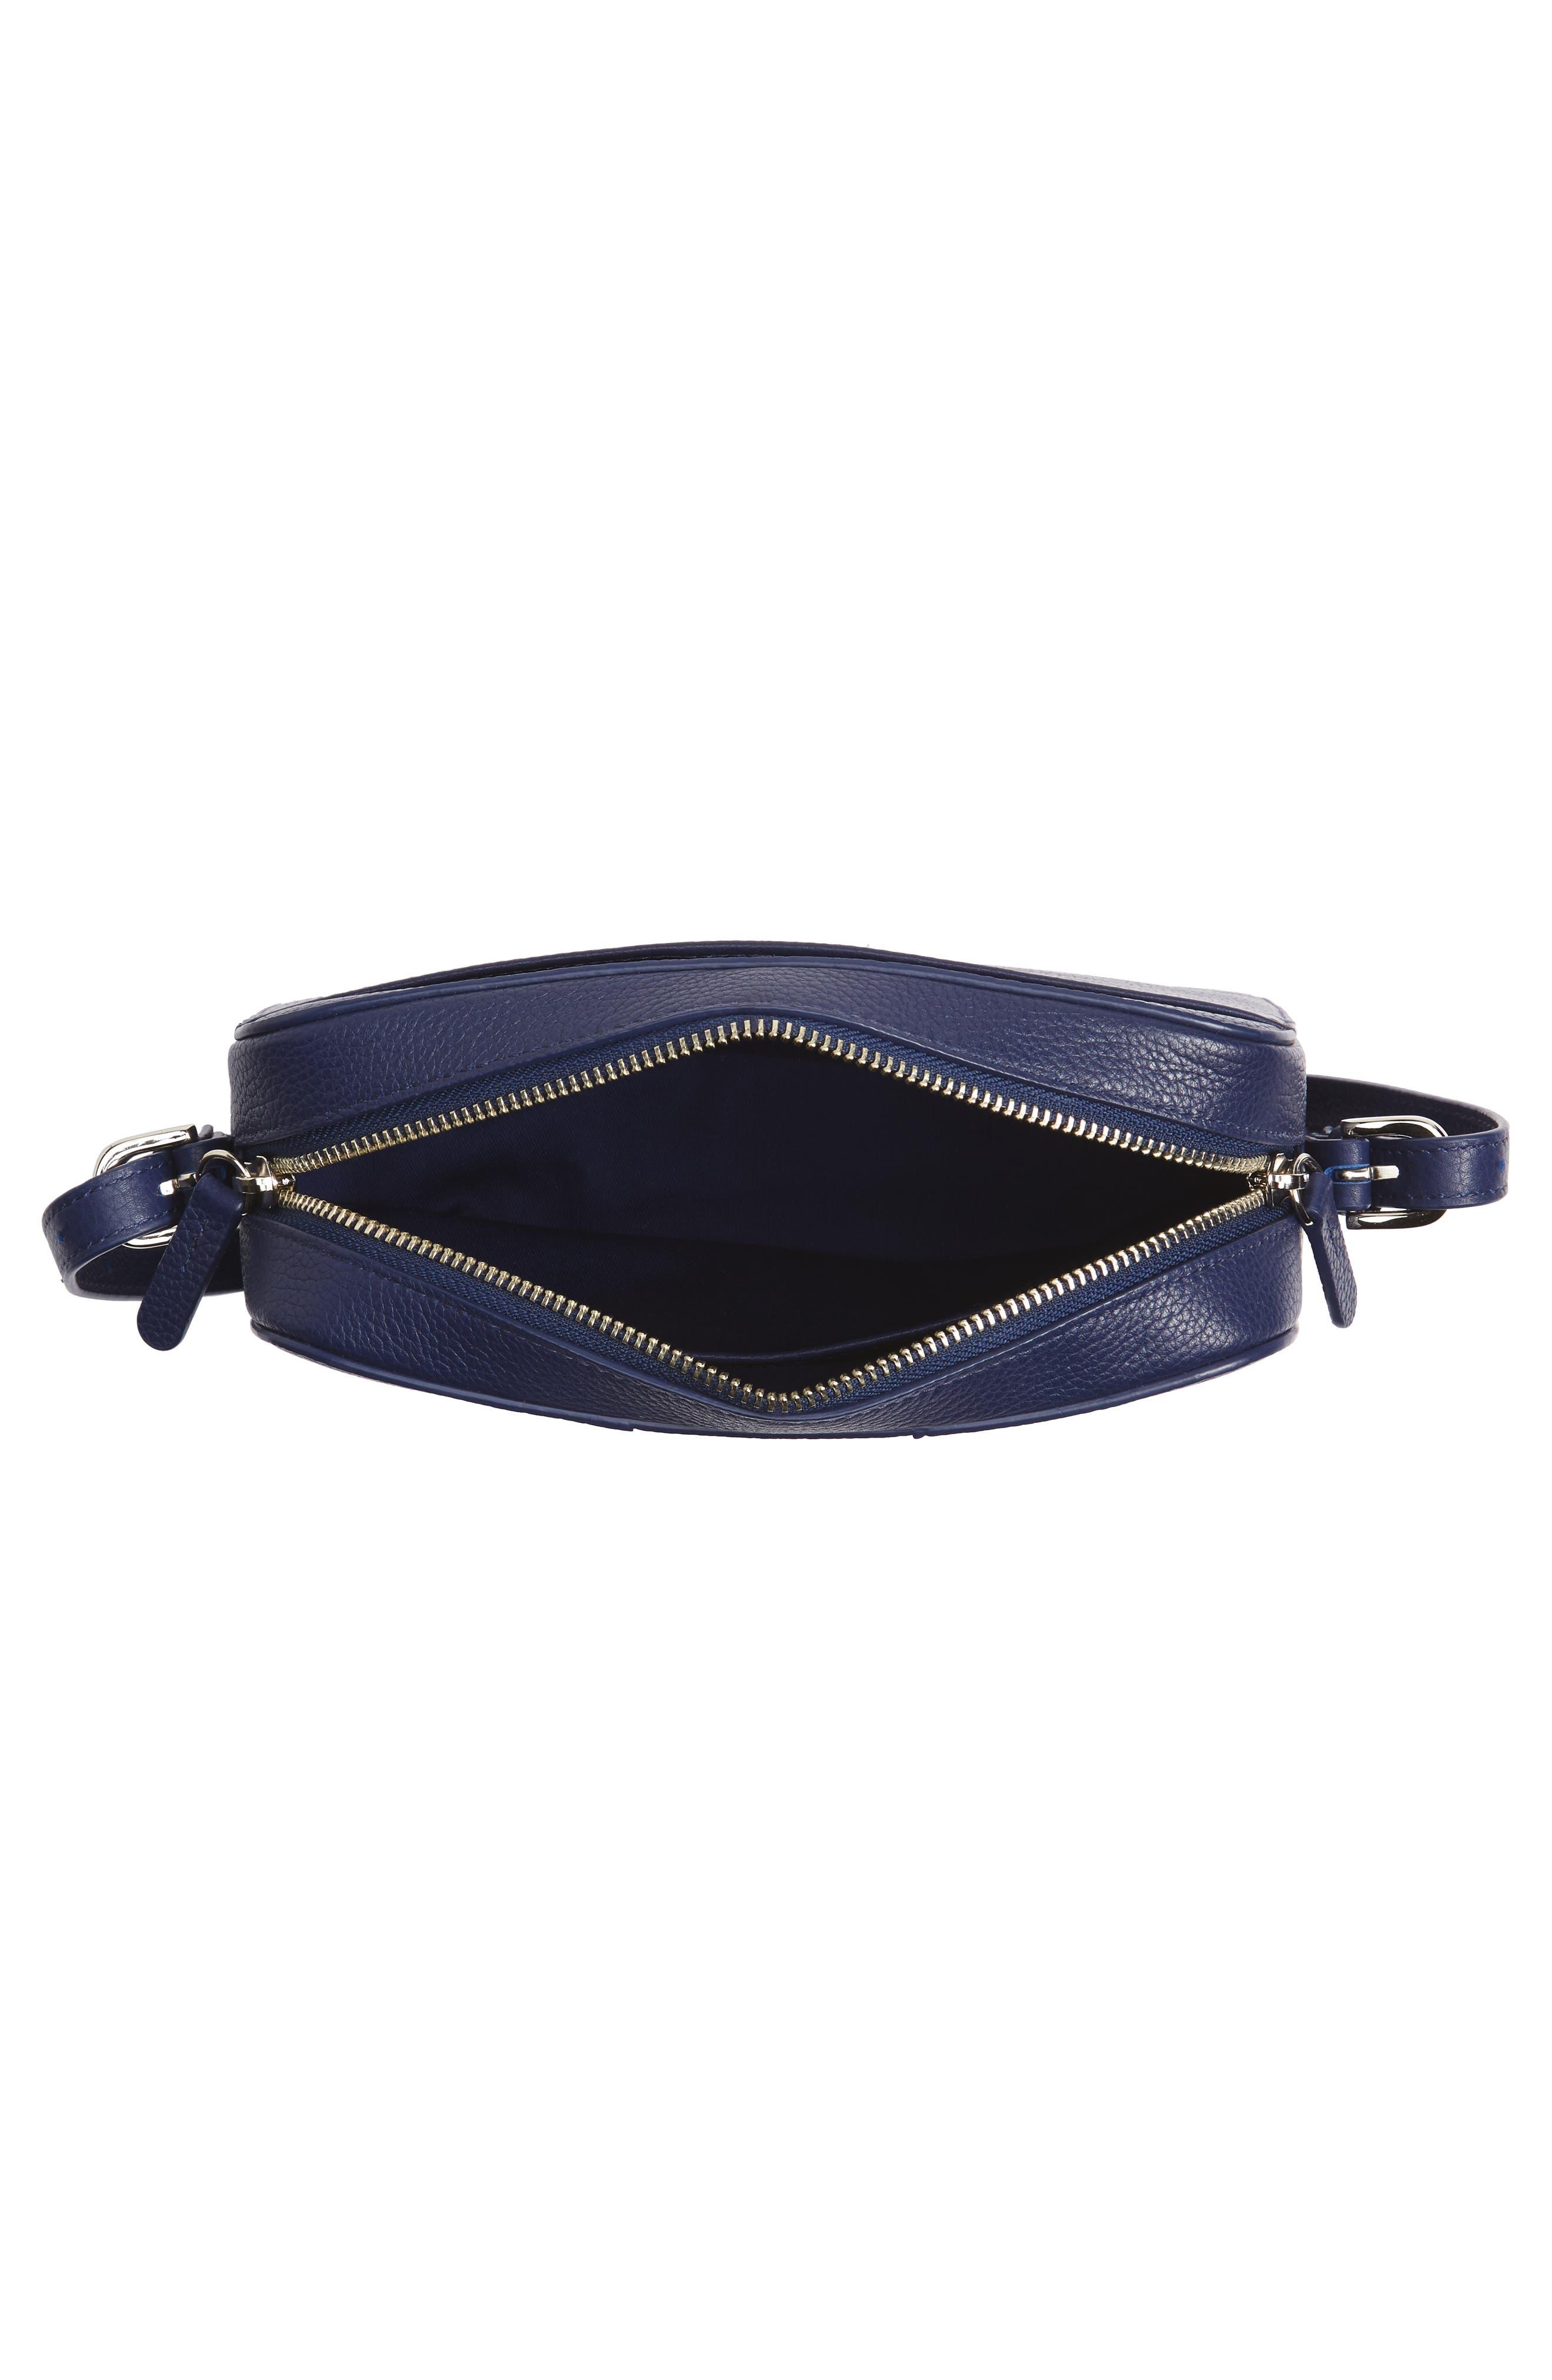 Brayden Leather Crossbody Camera Bag,                             Alternate thumbnail 19, color,